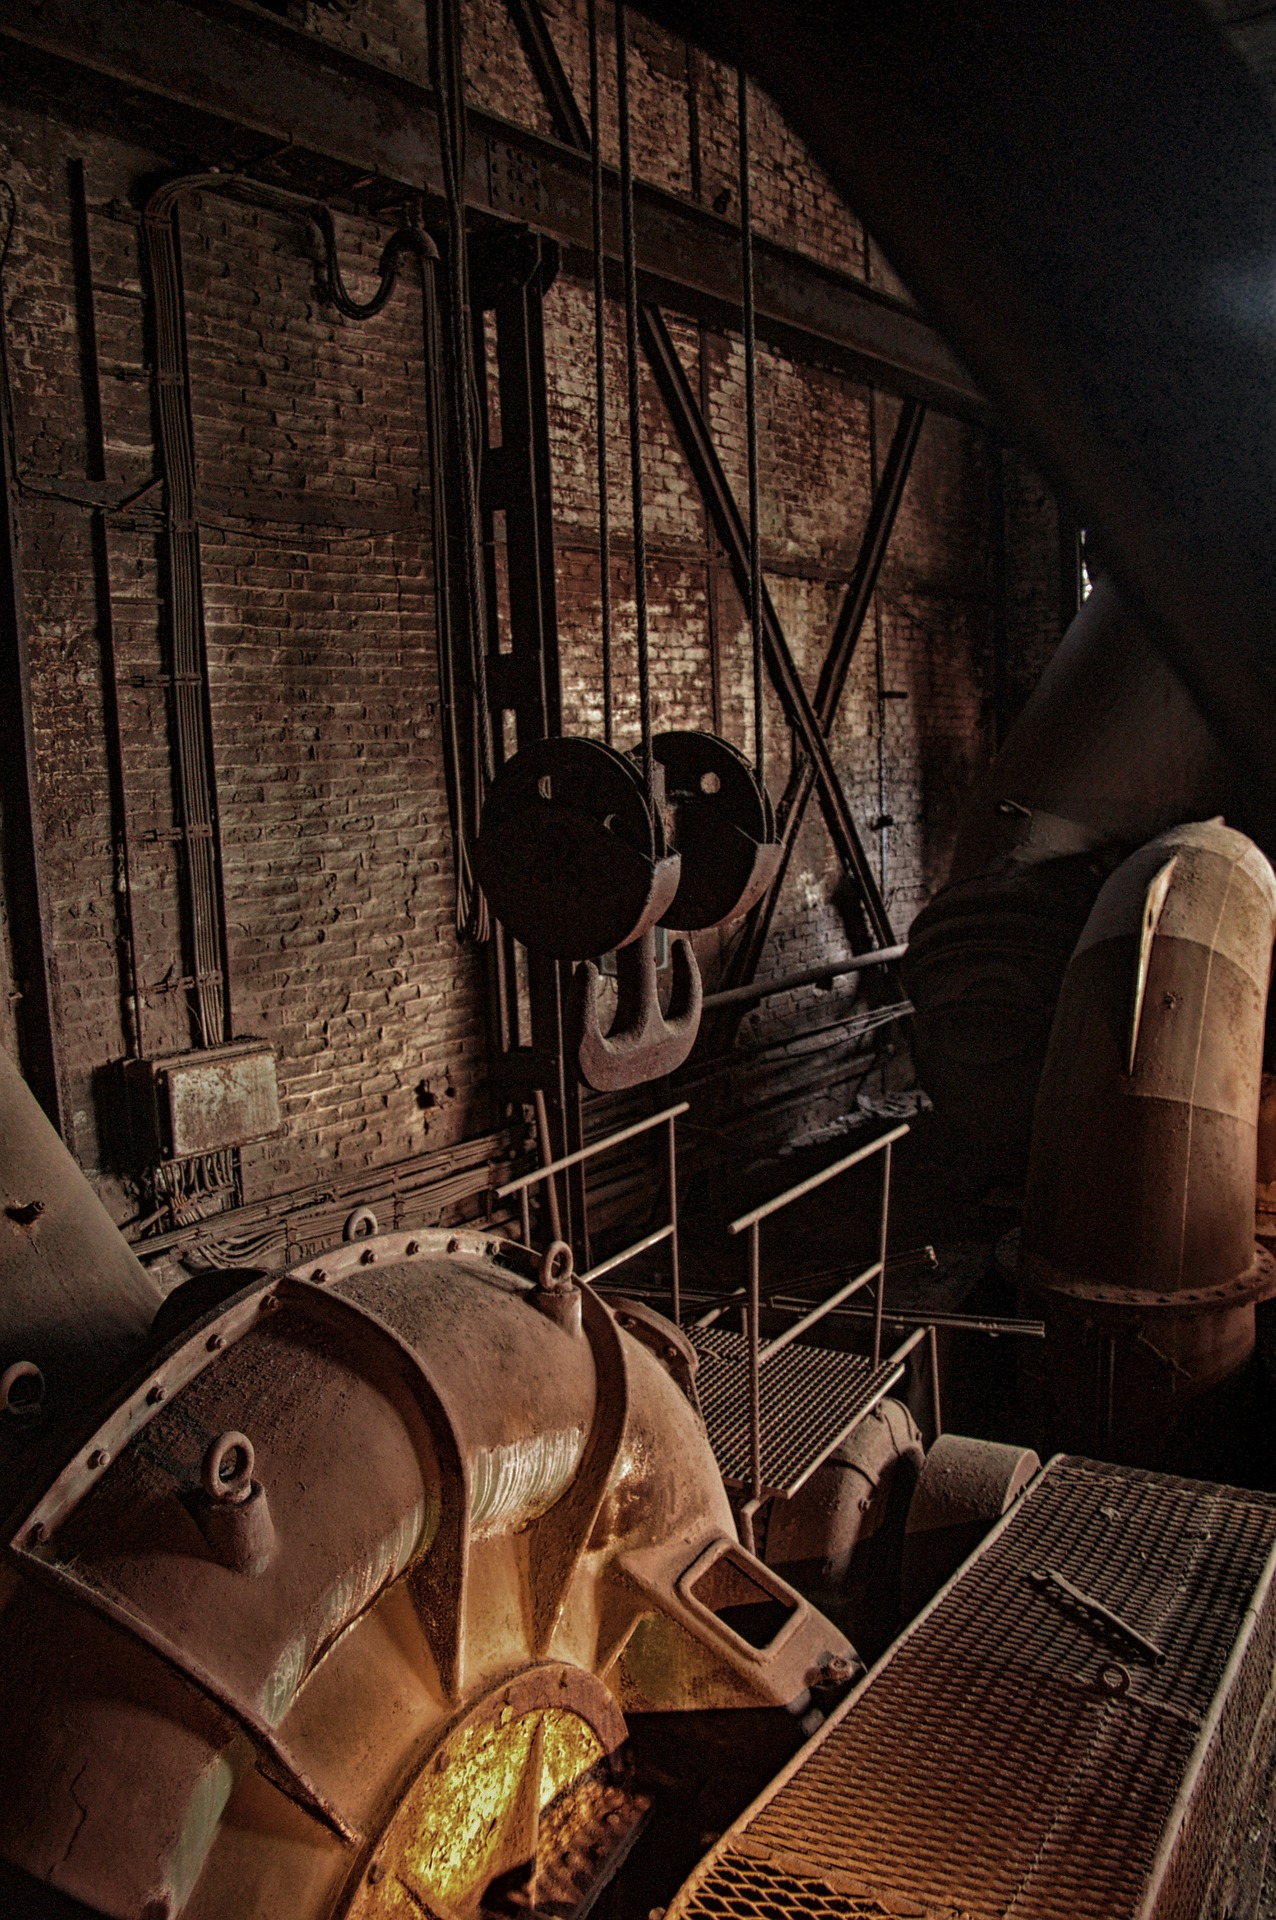 Urlaub im Saarland, Völklinger Hütte, Industrielle Revolution